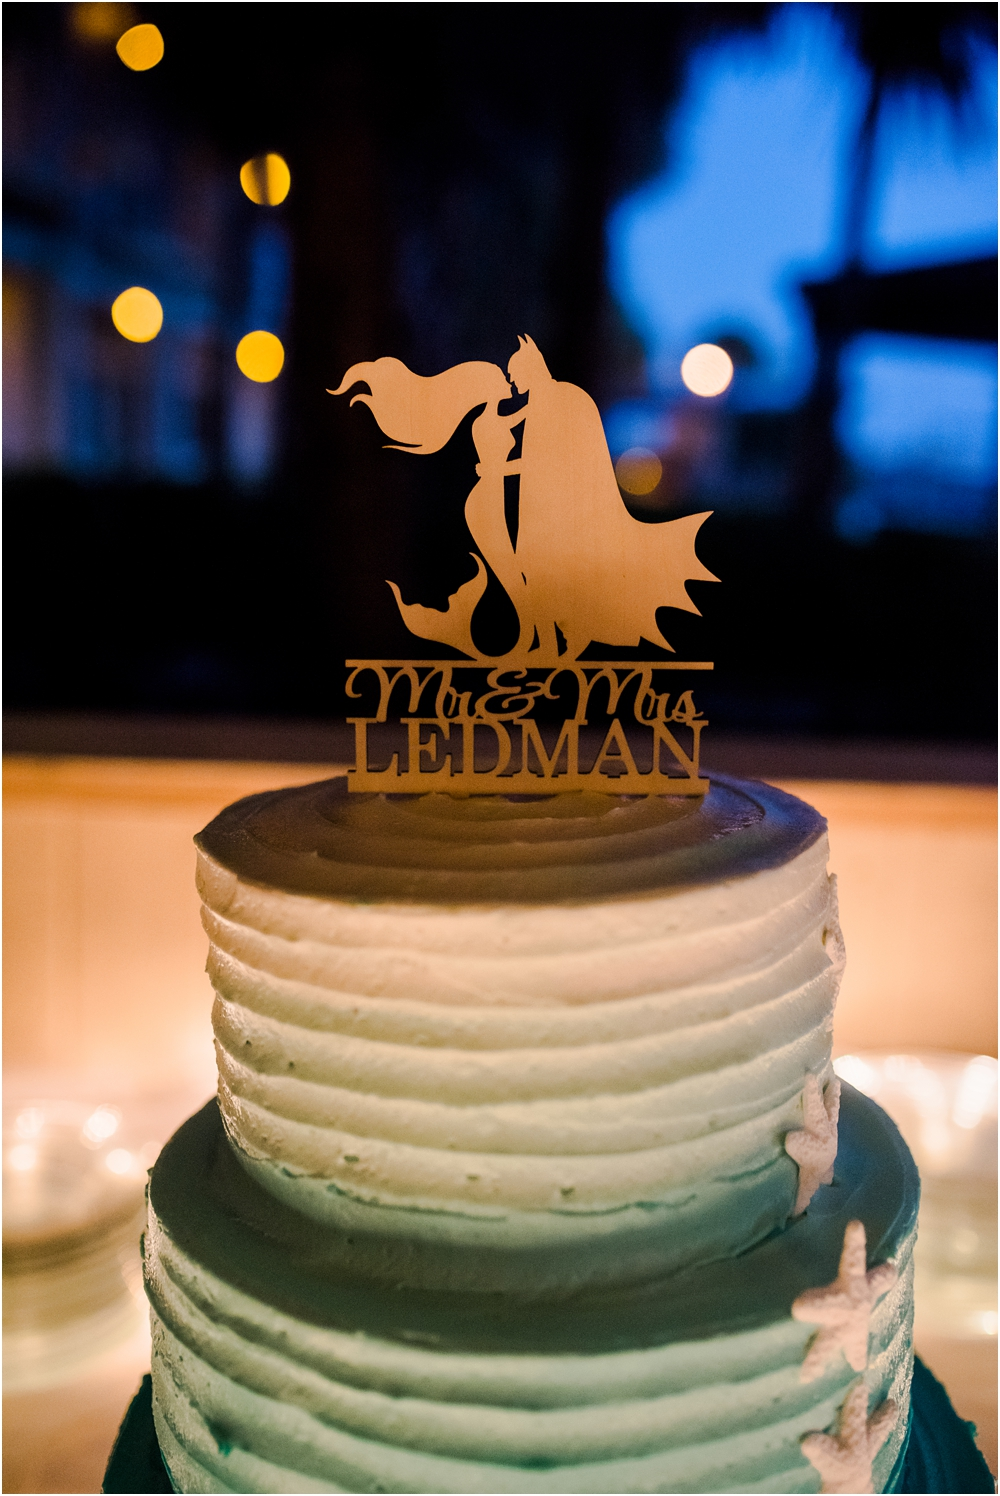 ledman-wedding-kiersten-stevenson-photography-30a-panama-city-beach-dothan-tallahassee-(573-of-763).JPG